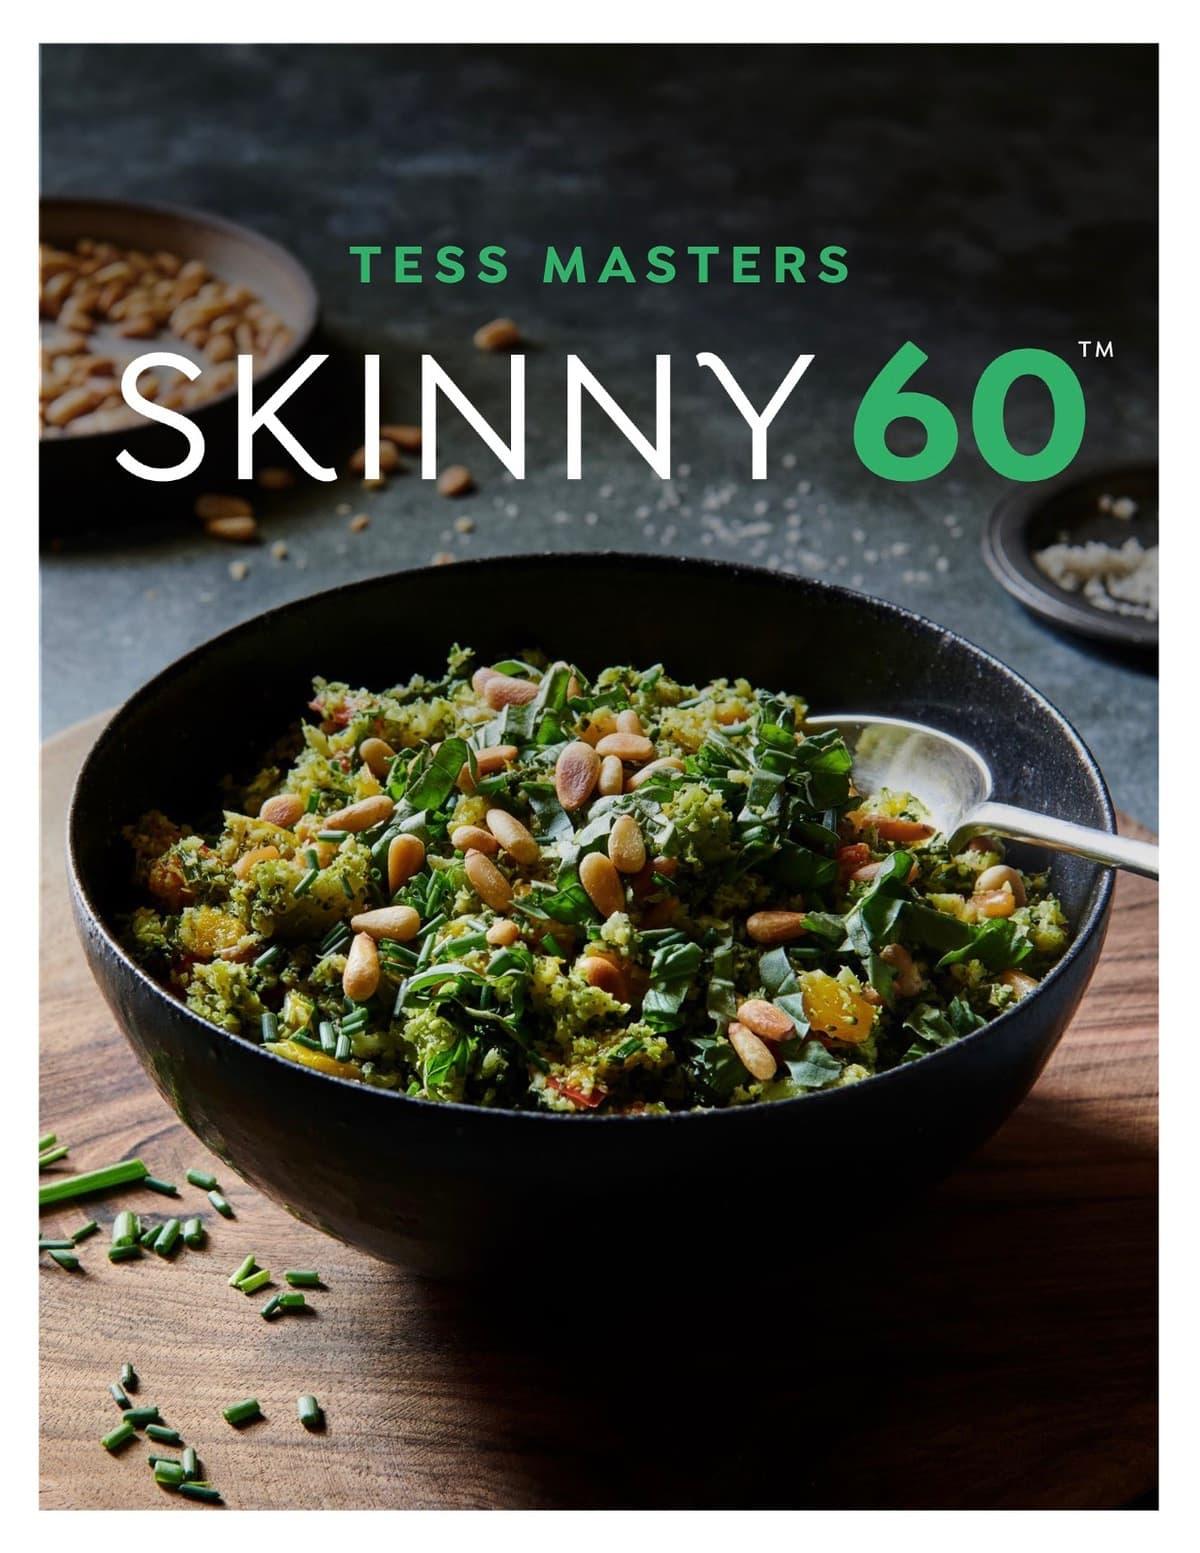 Skinny60™ Weight Loss Program